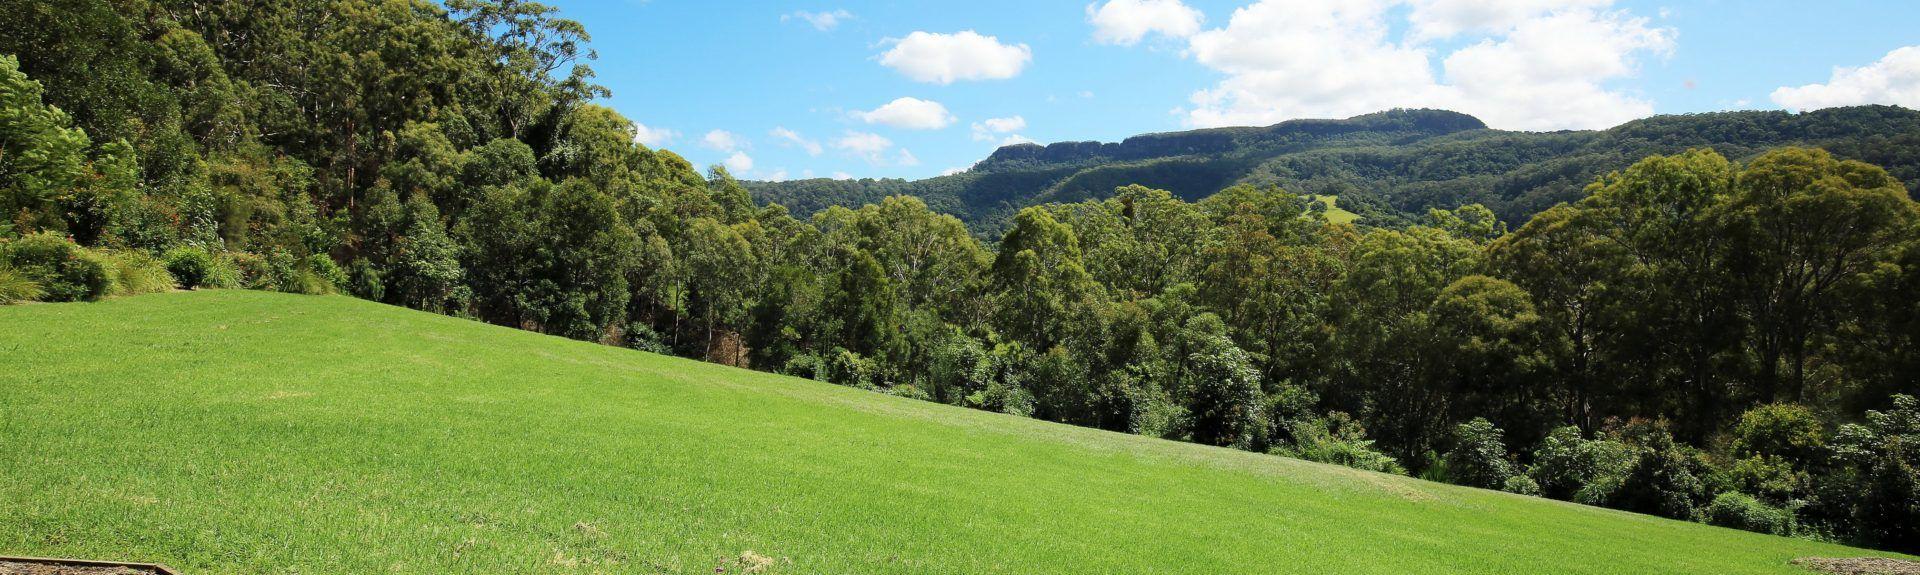 Woodhill, New South Wales, Australia